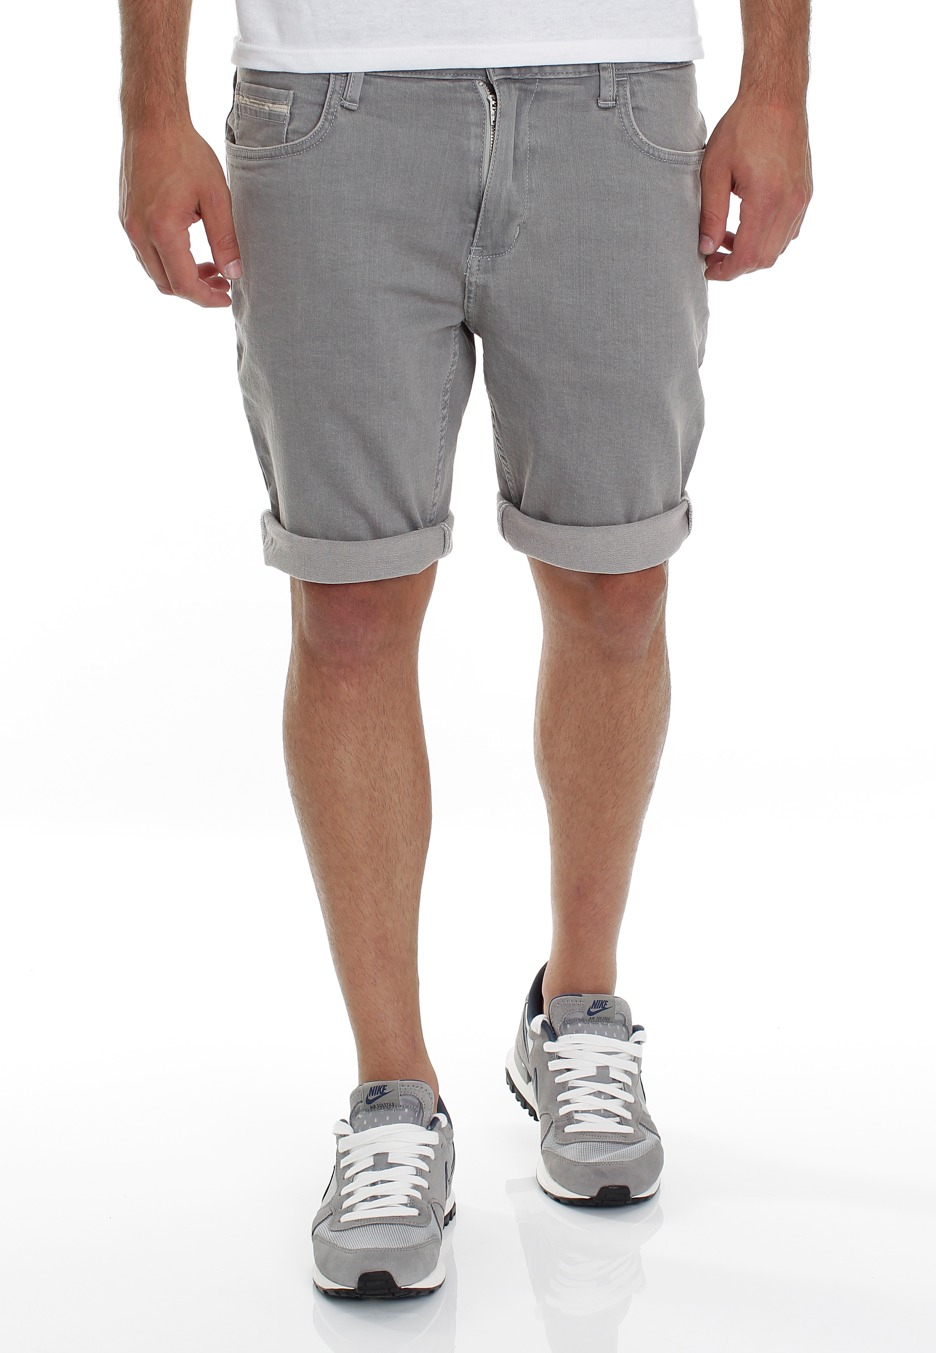 vans grey shorts